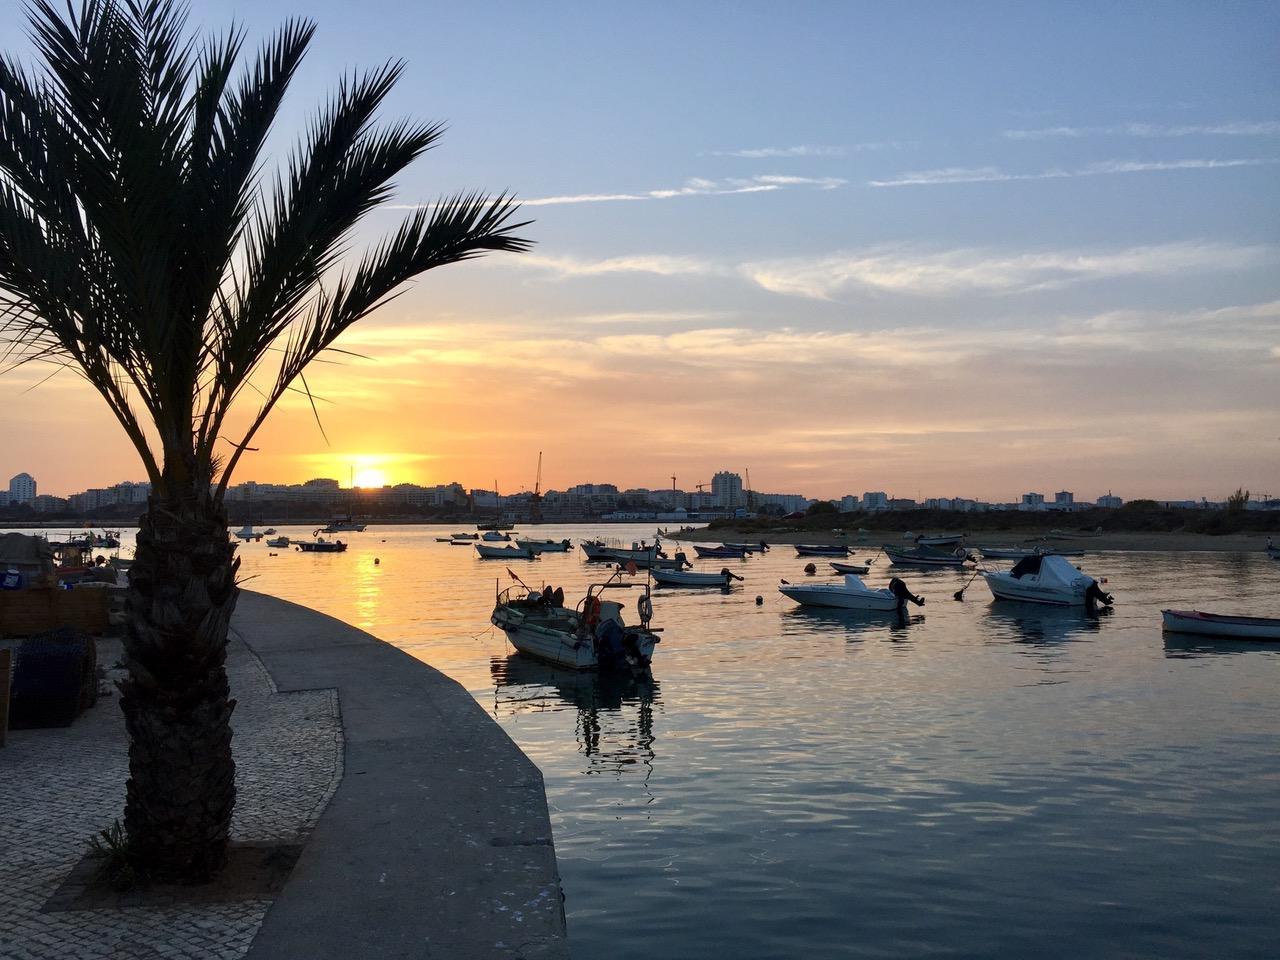 Sunset at Ferragudo harbor, Algarve, Portugal